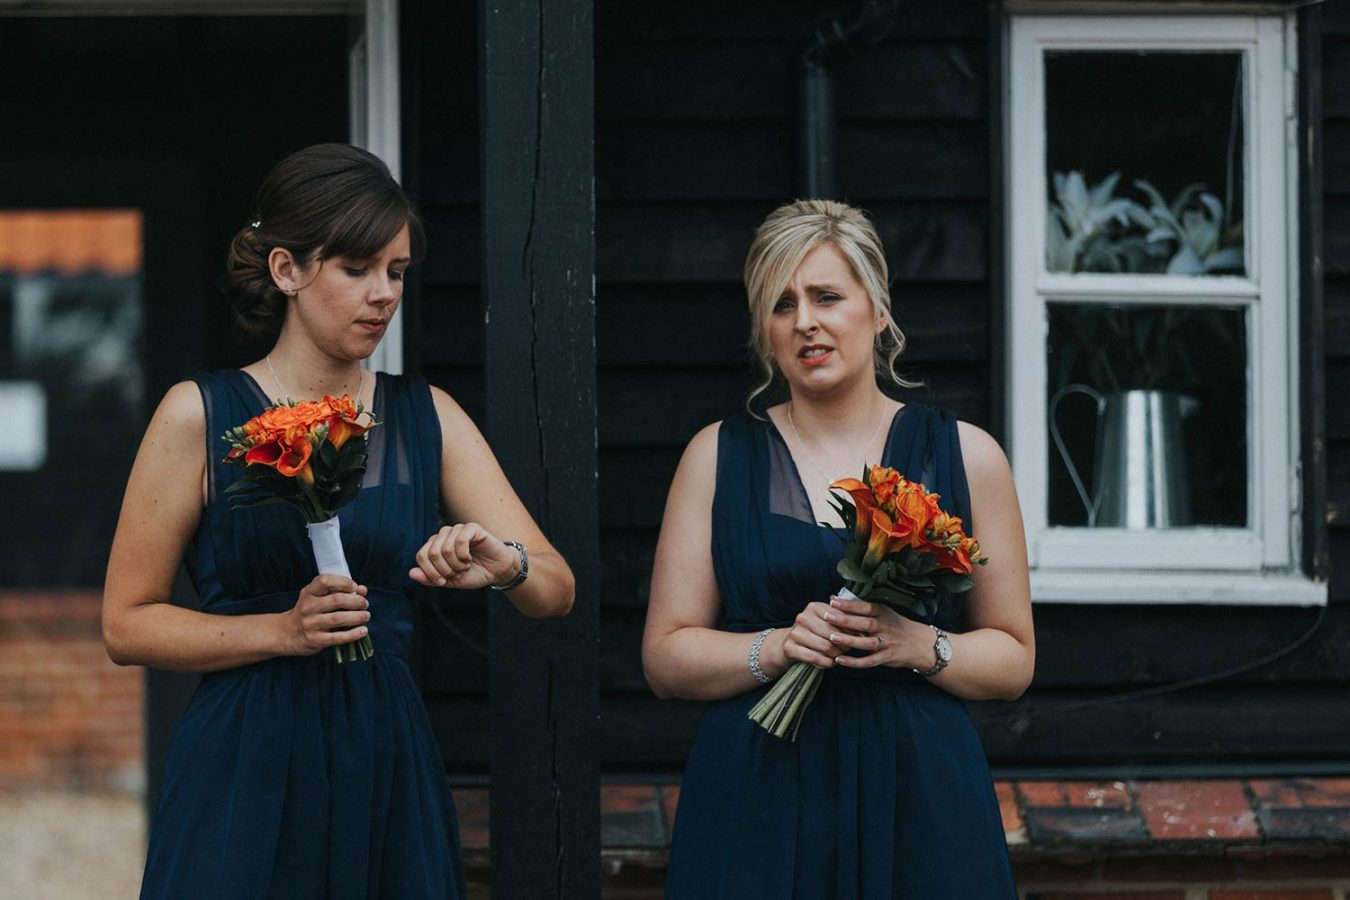 vaulty-manor-wedding-photography-084